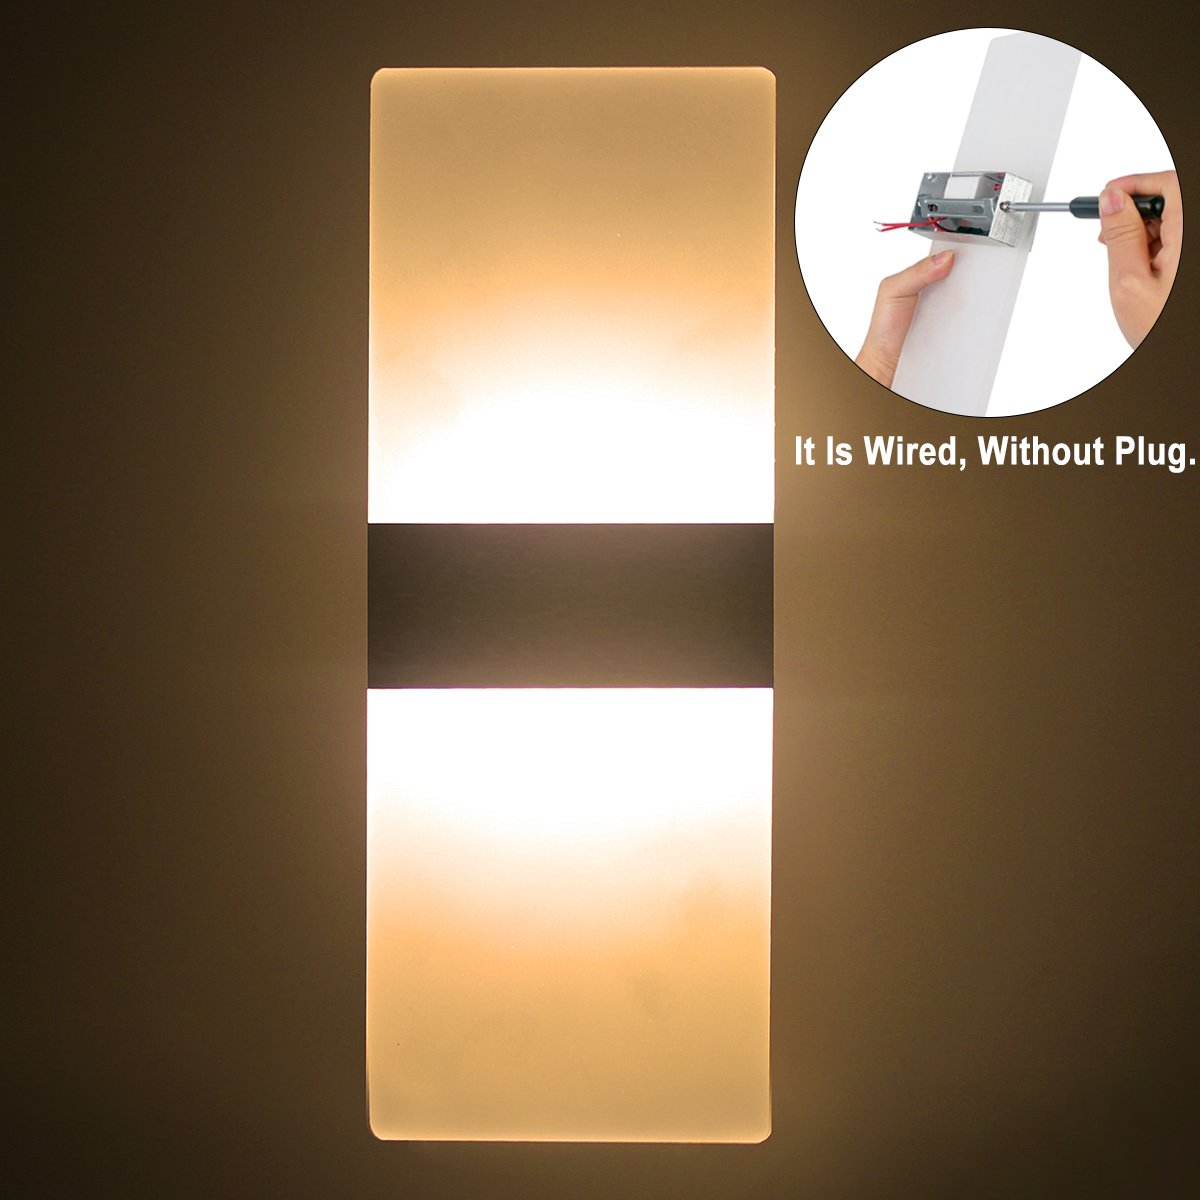 Romantic Wall Sconce Light: Amazon.com